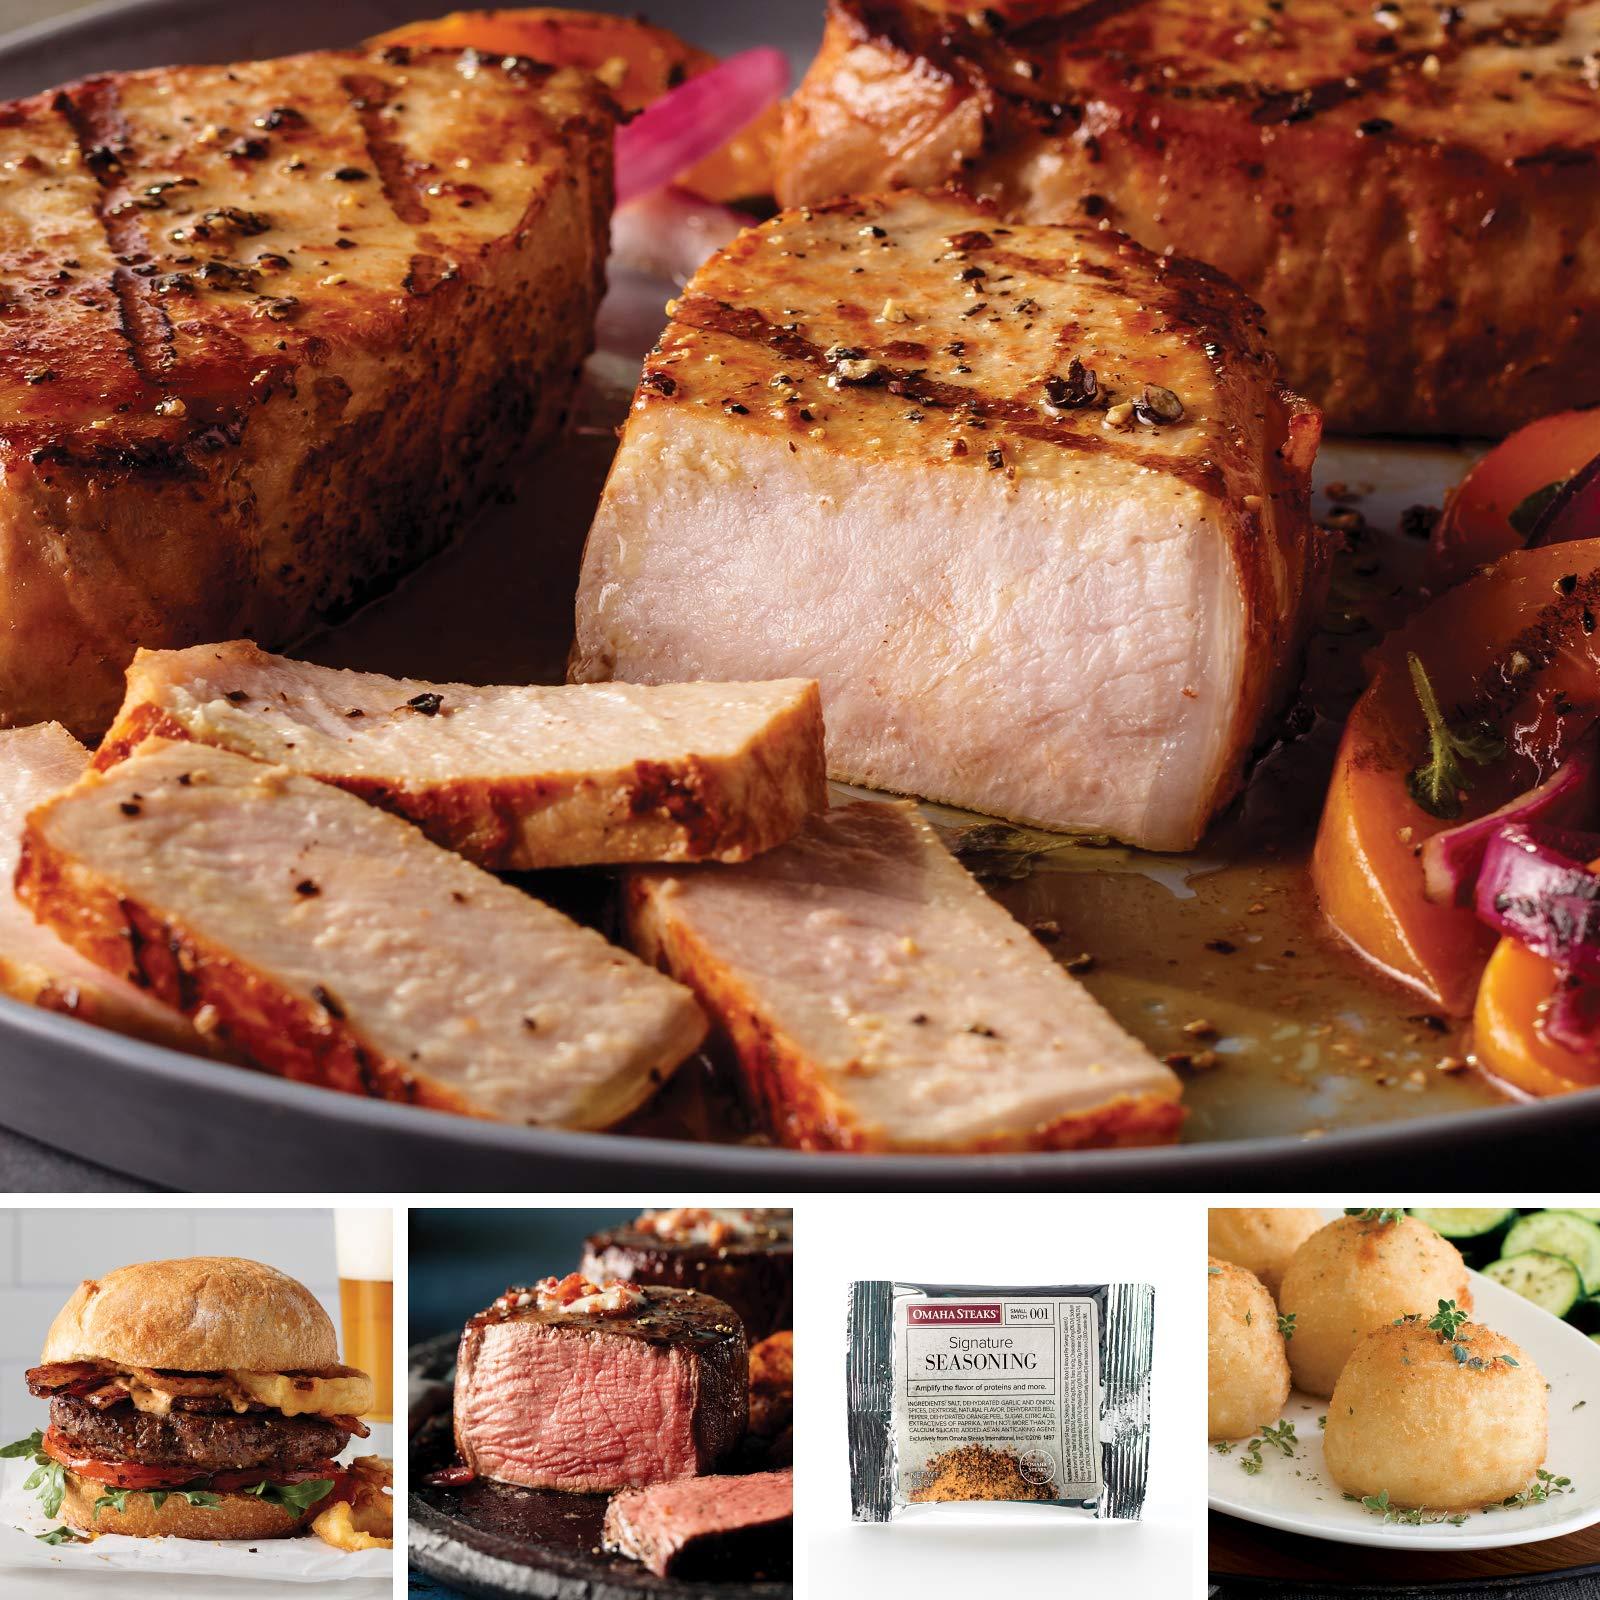 Omaha Steaks Gourmet Gathering Gift Combo (13-Piece with Filet Mignons, Boneless Pork Chops, Steak Burgers, Potatoes Au Gratin, and Signature Seasoning)